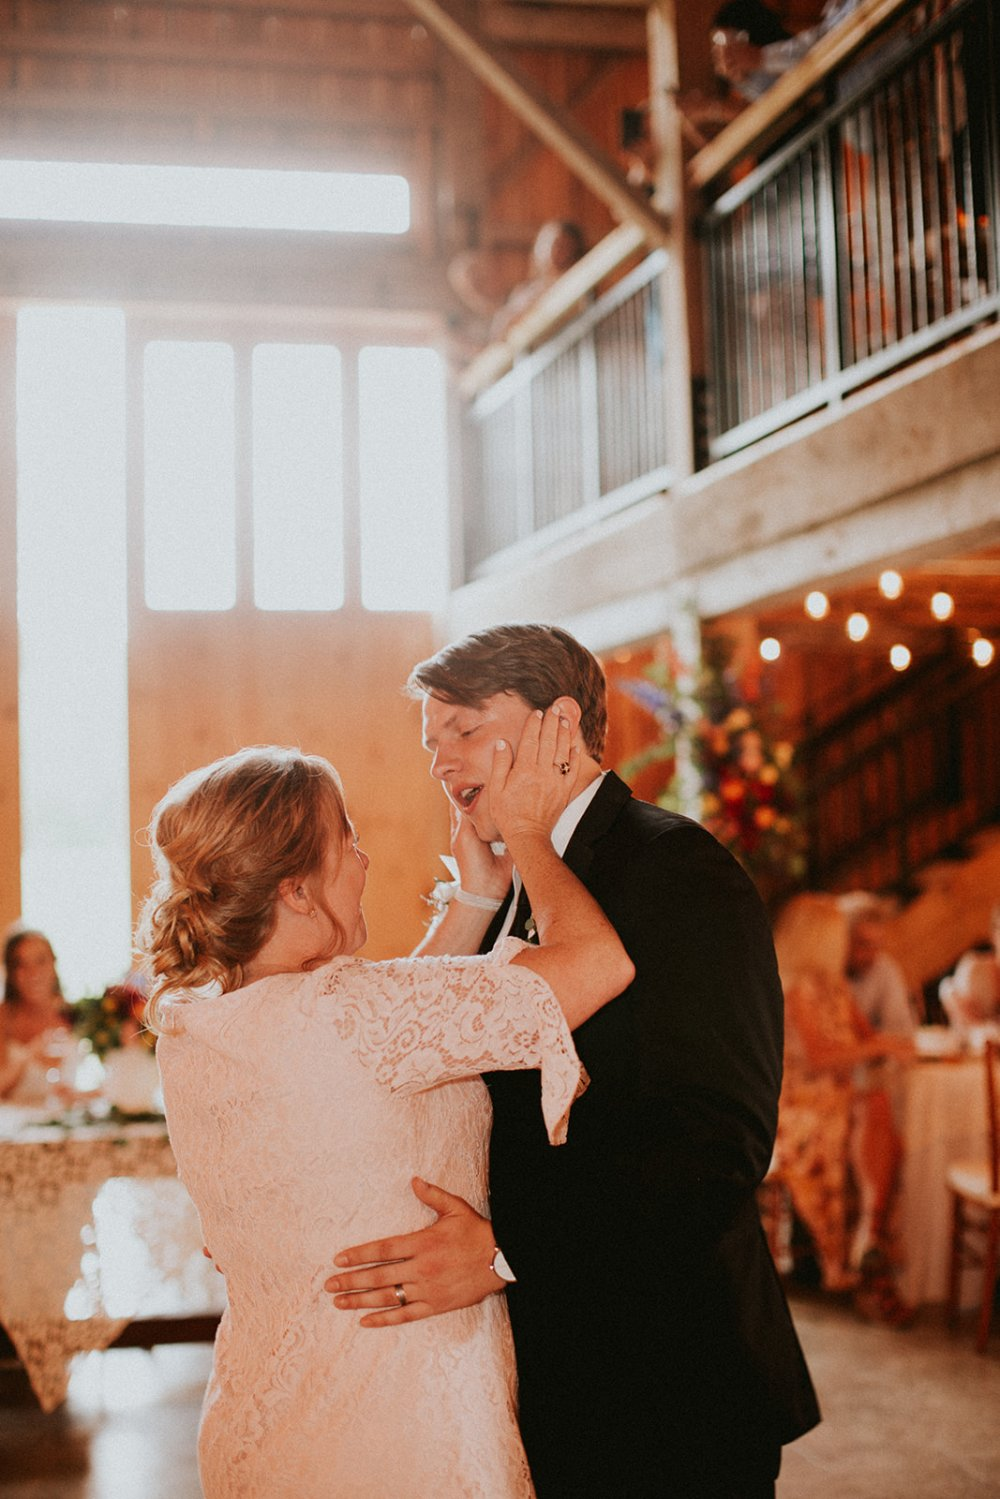 Calan-Adam-WEDDING-JUNE-2019-110.jpg